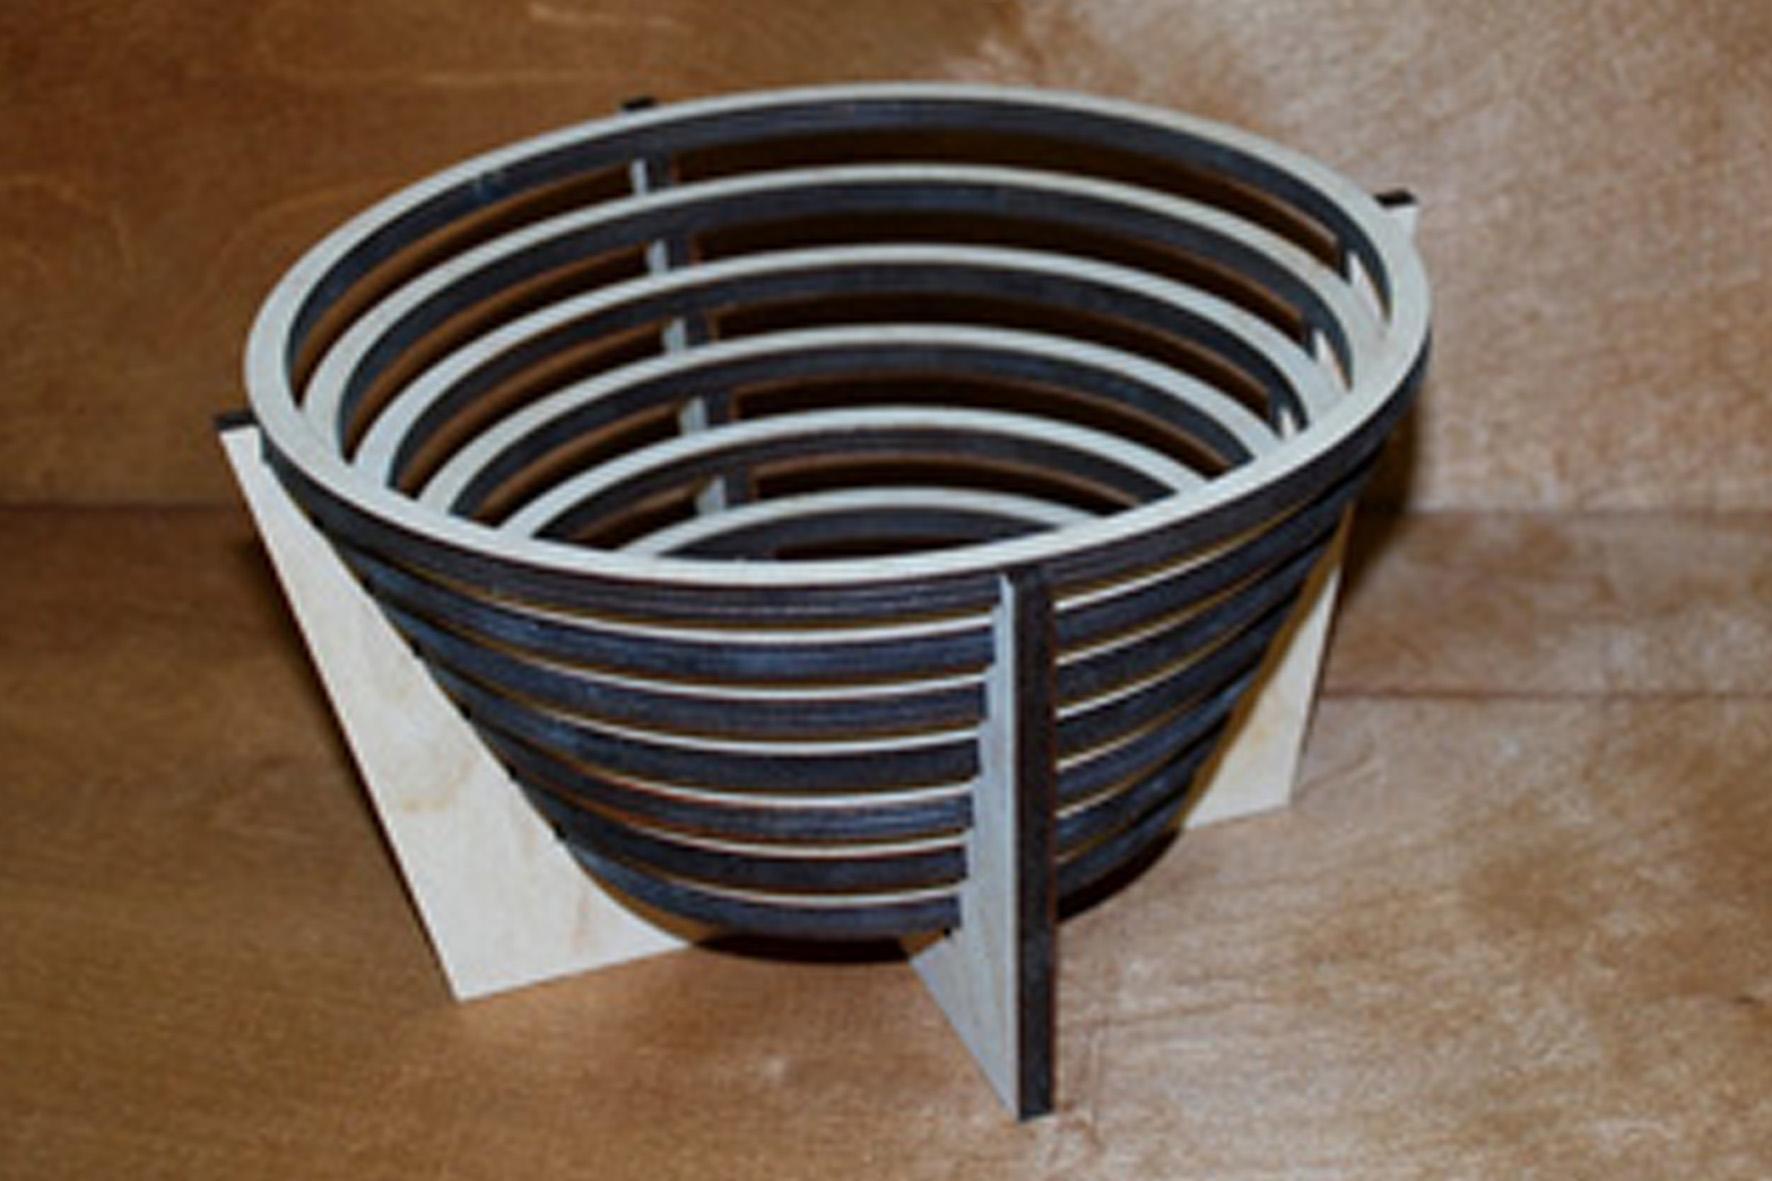 Laser Cut Wooden Decorative Vase Free Vector